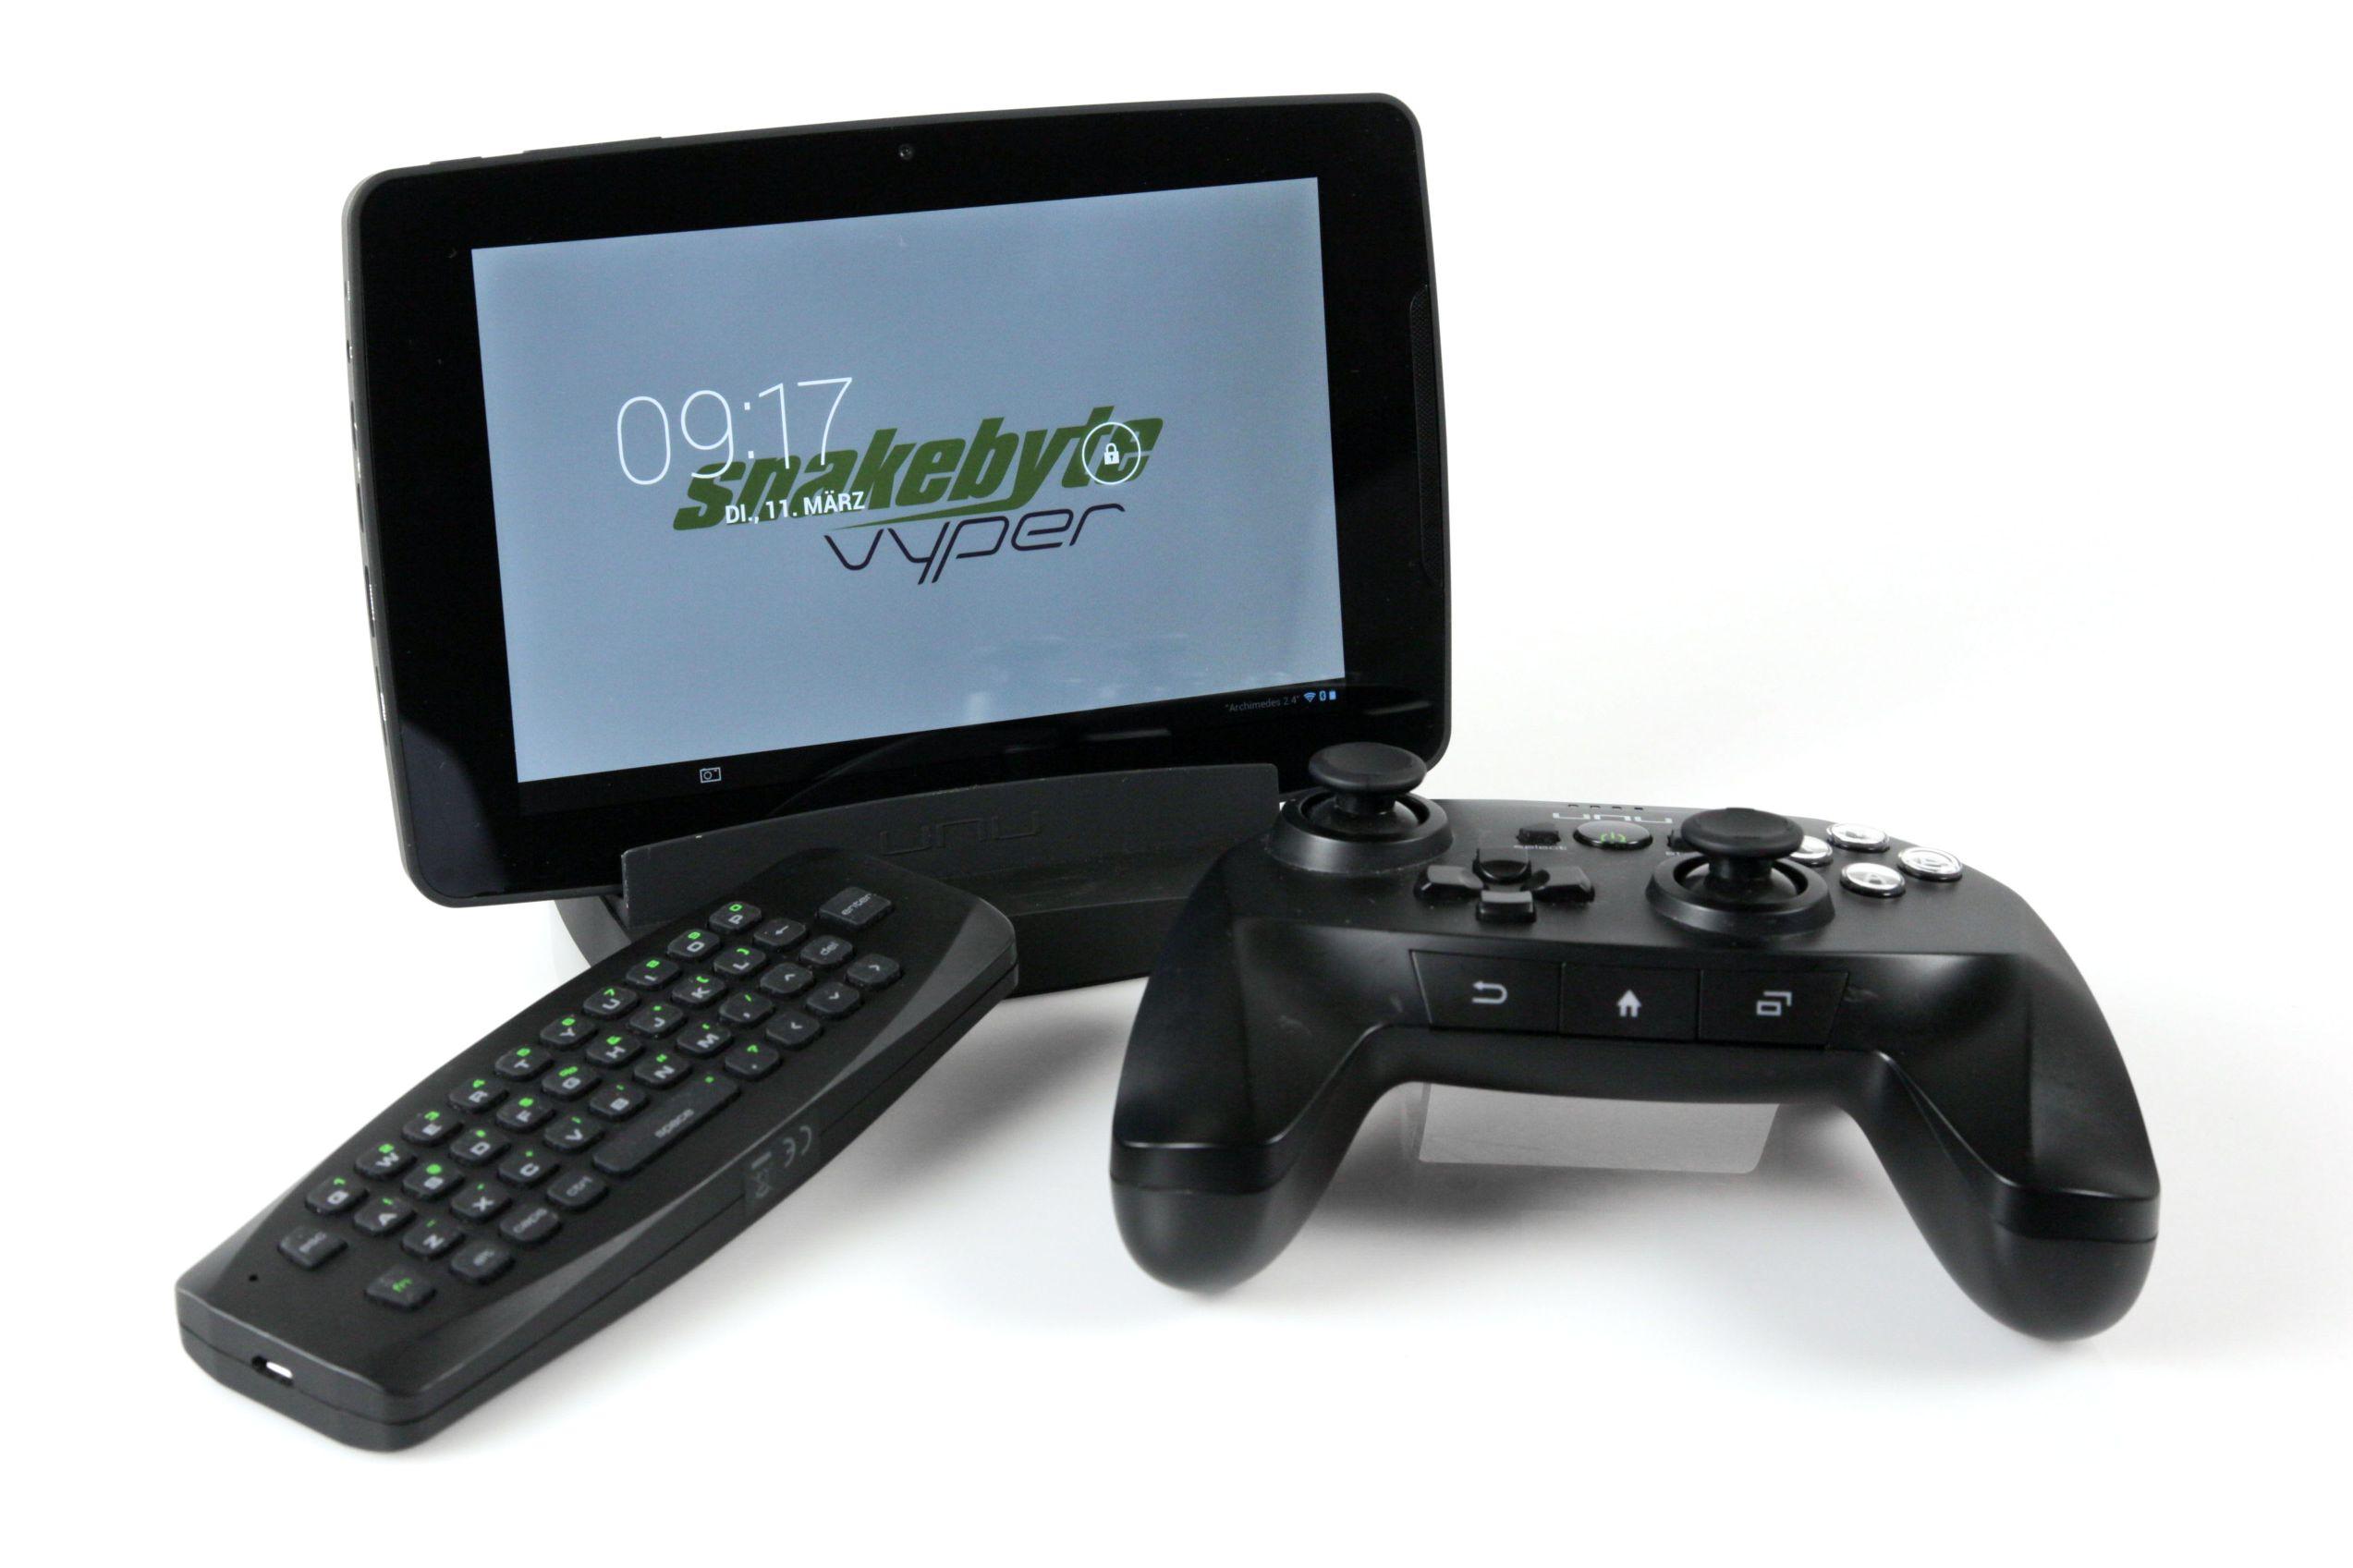 Snakebyte Vyper im Test: Gut gedacht, schlecht gemacht - Das Snakebyte Vyper ist Tablet, Smart-TV-Erweiterung und Spielekonsole zugleich. (Bild: Nina Sebayang/Golem.de)